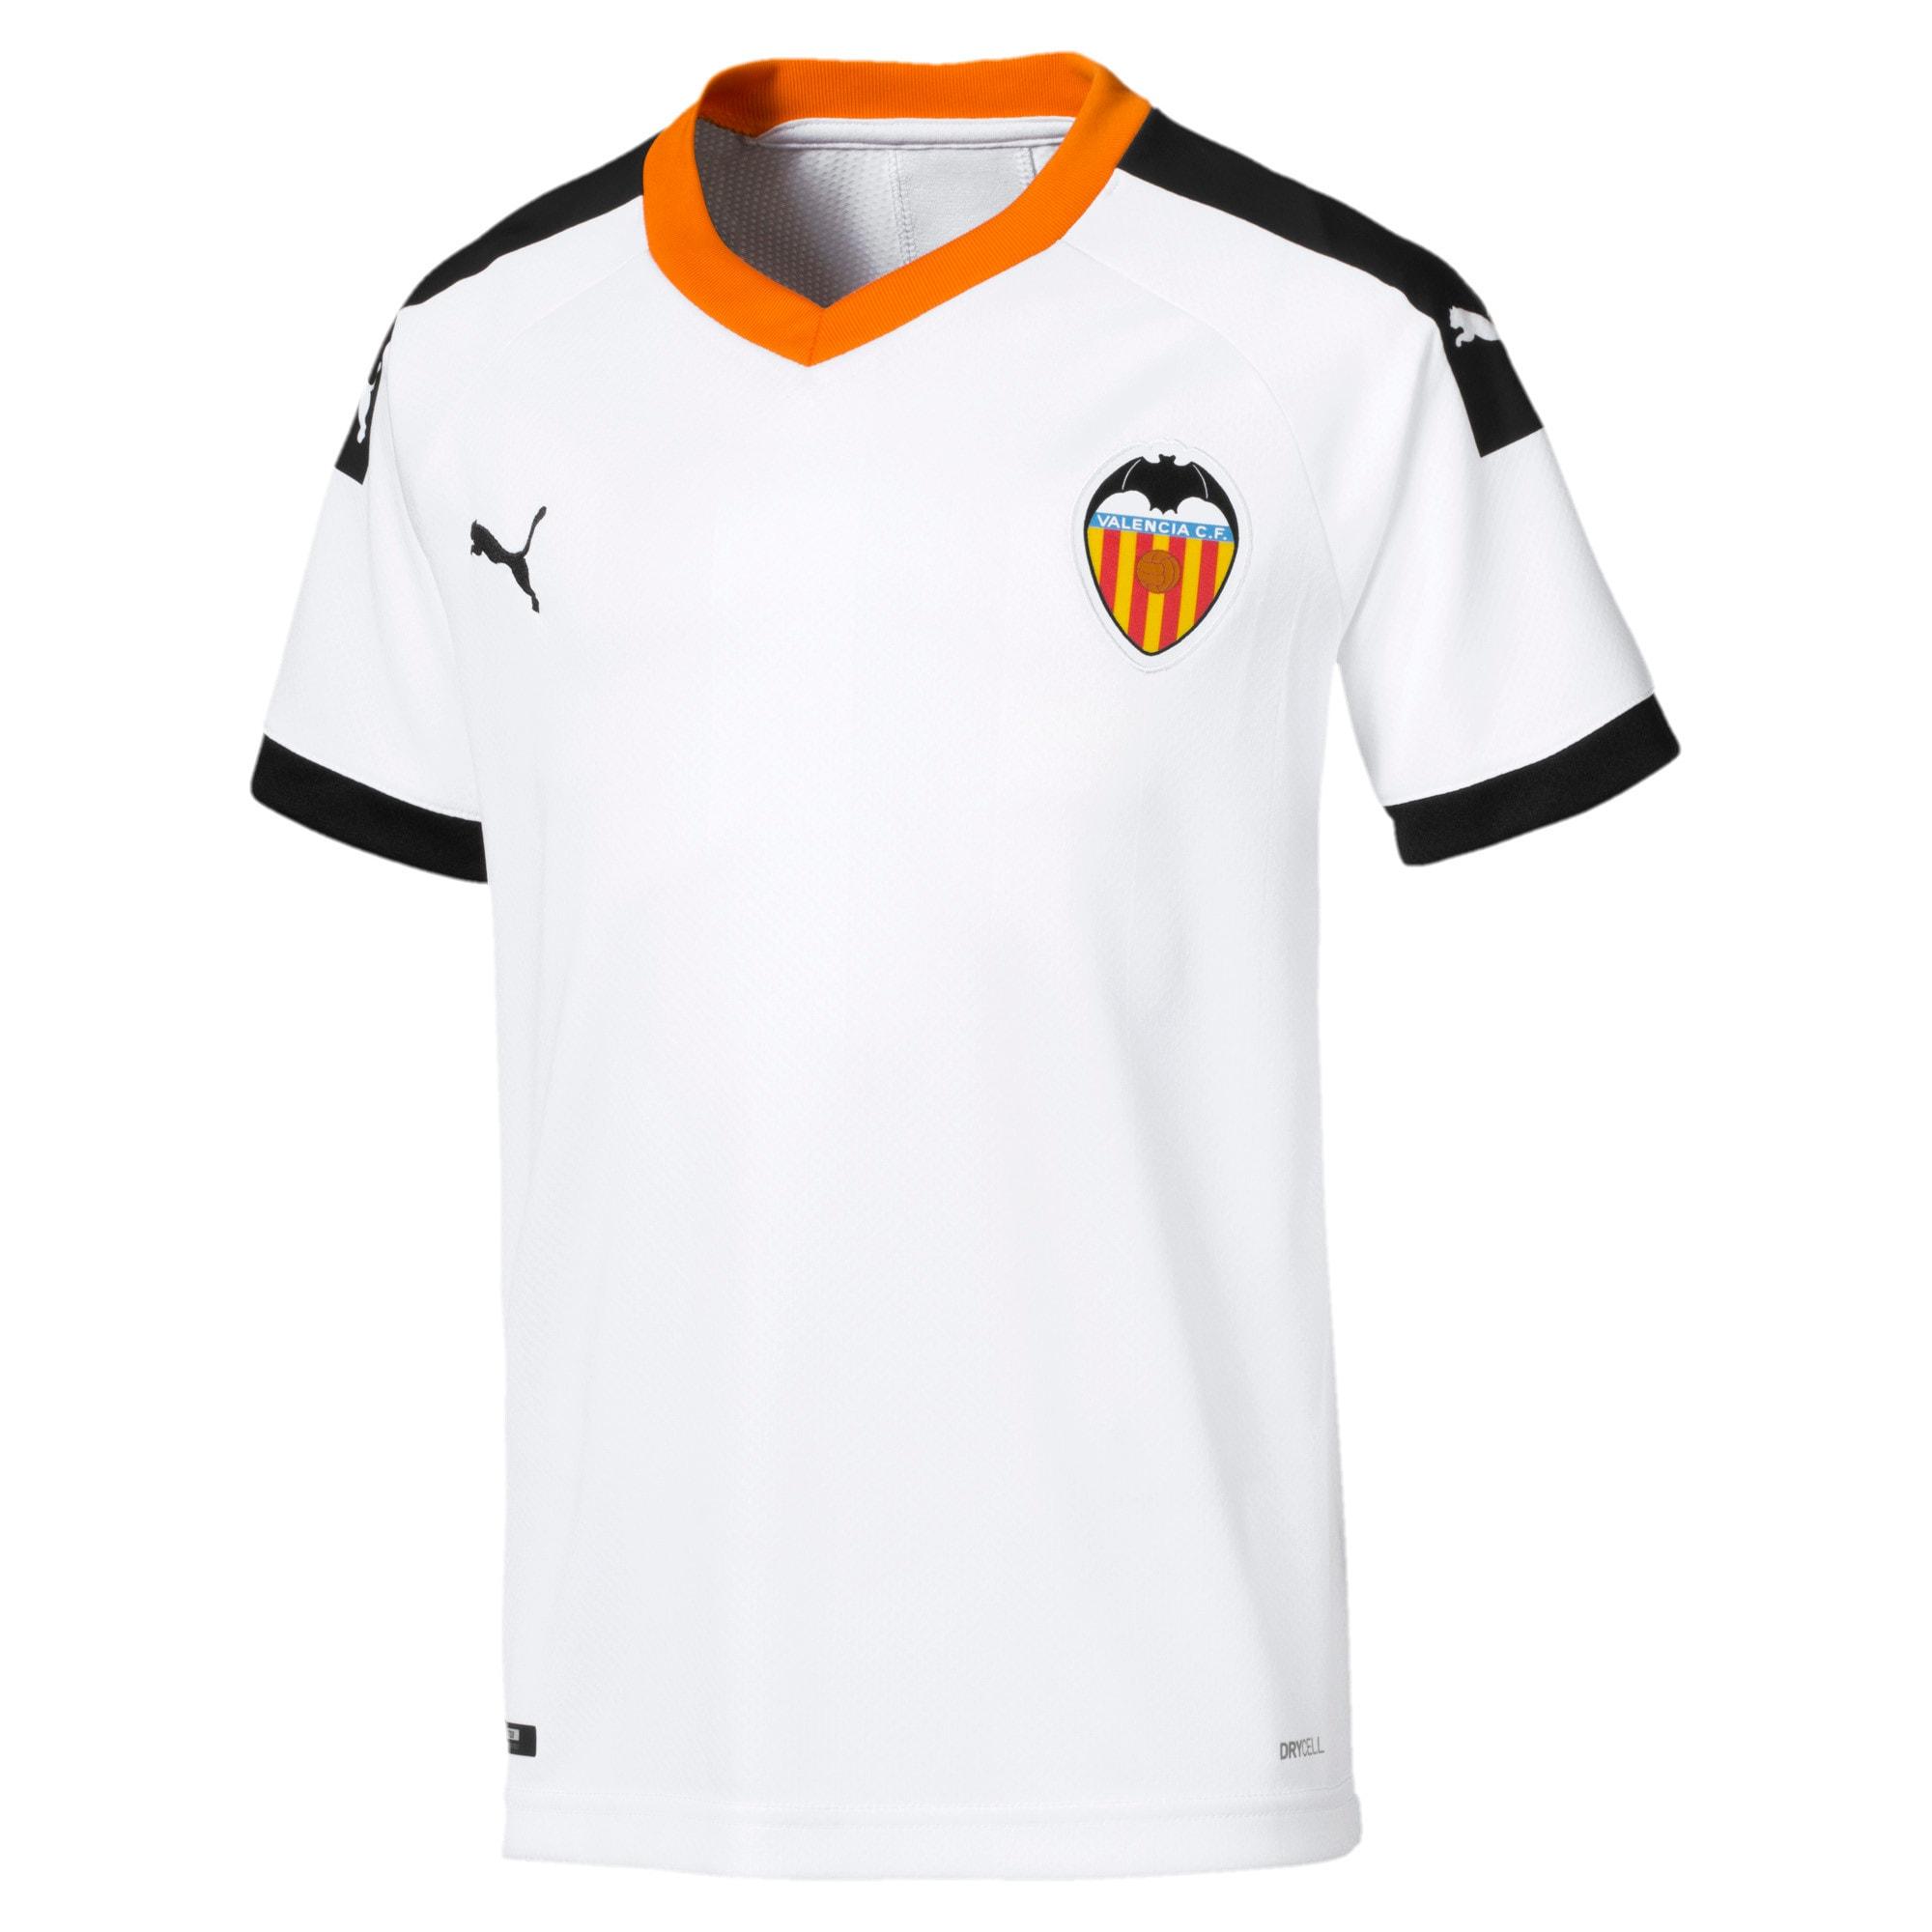 Thumbnail 1 of Valencia CF Home Replica Kids' Jersey, White- Black-Vibrant Orange, medium